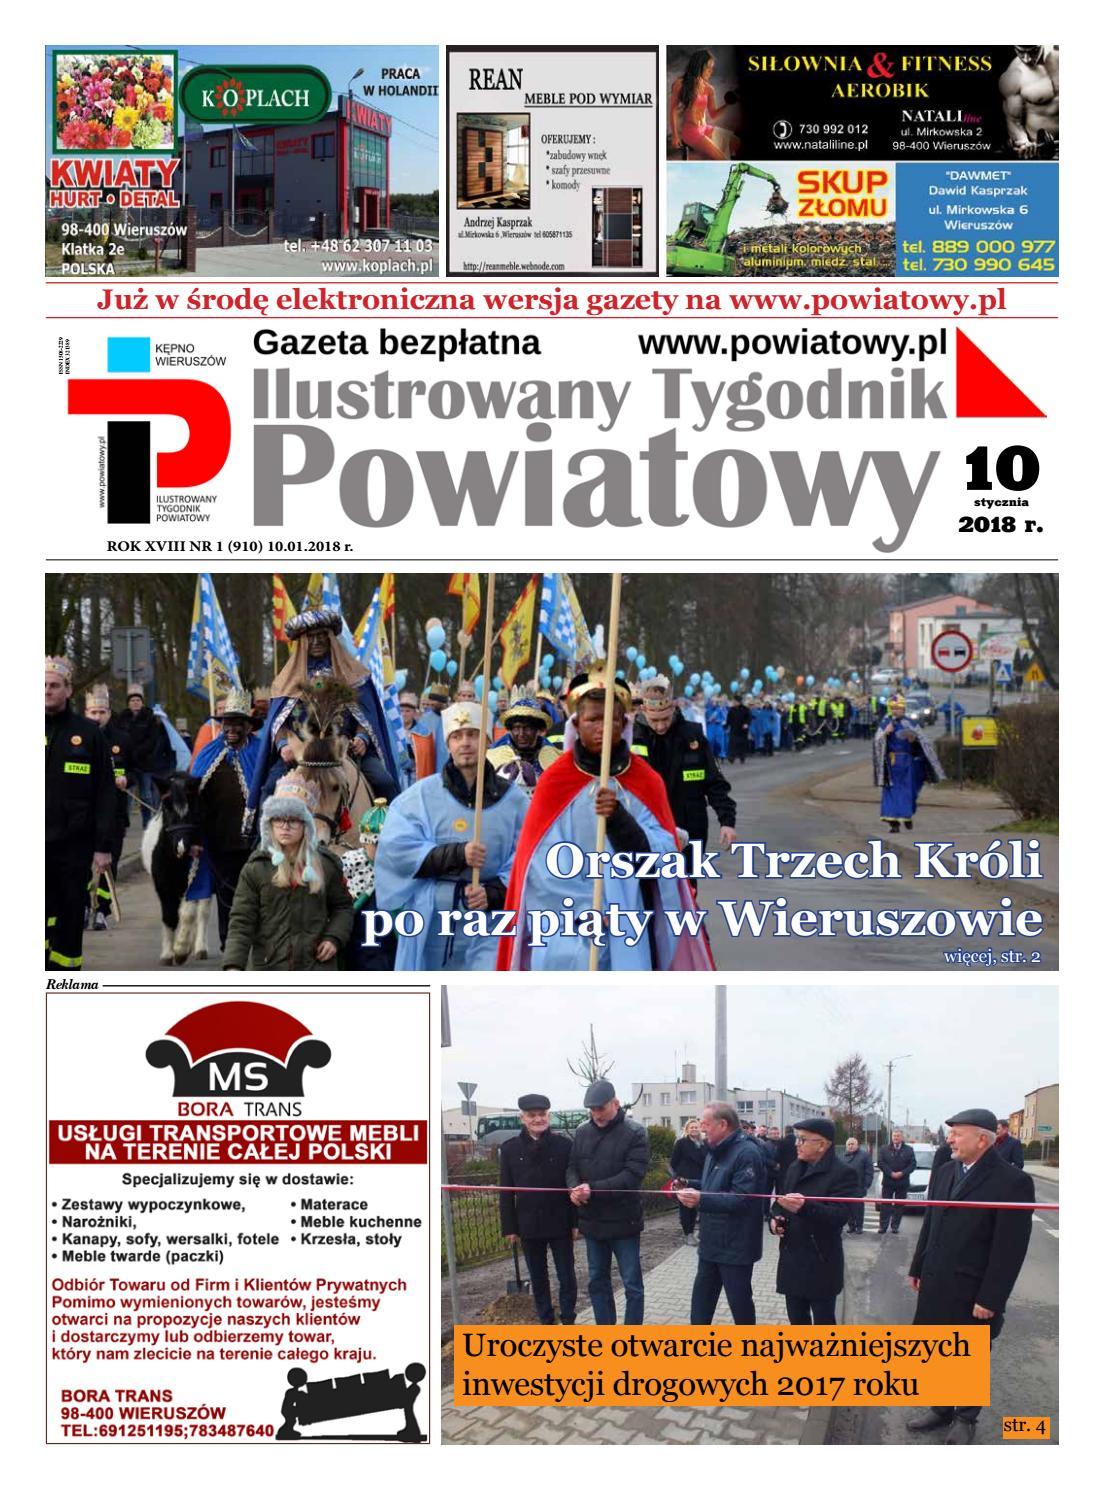 Ogoszenia - archiwum - Parafia w. apostow Piotra i Pawa